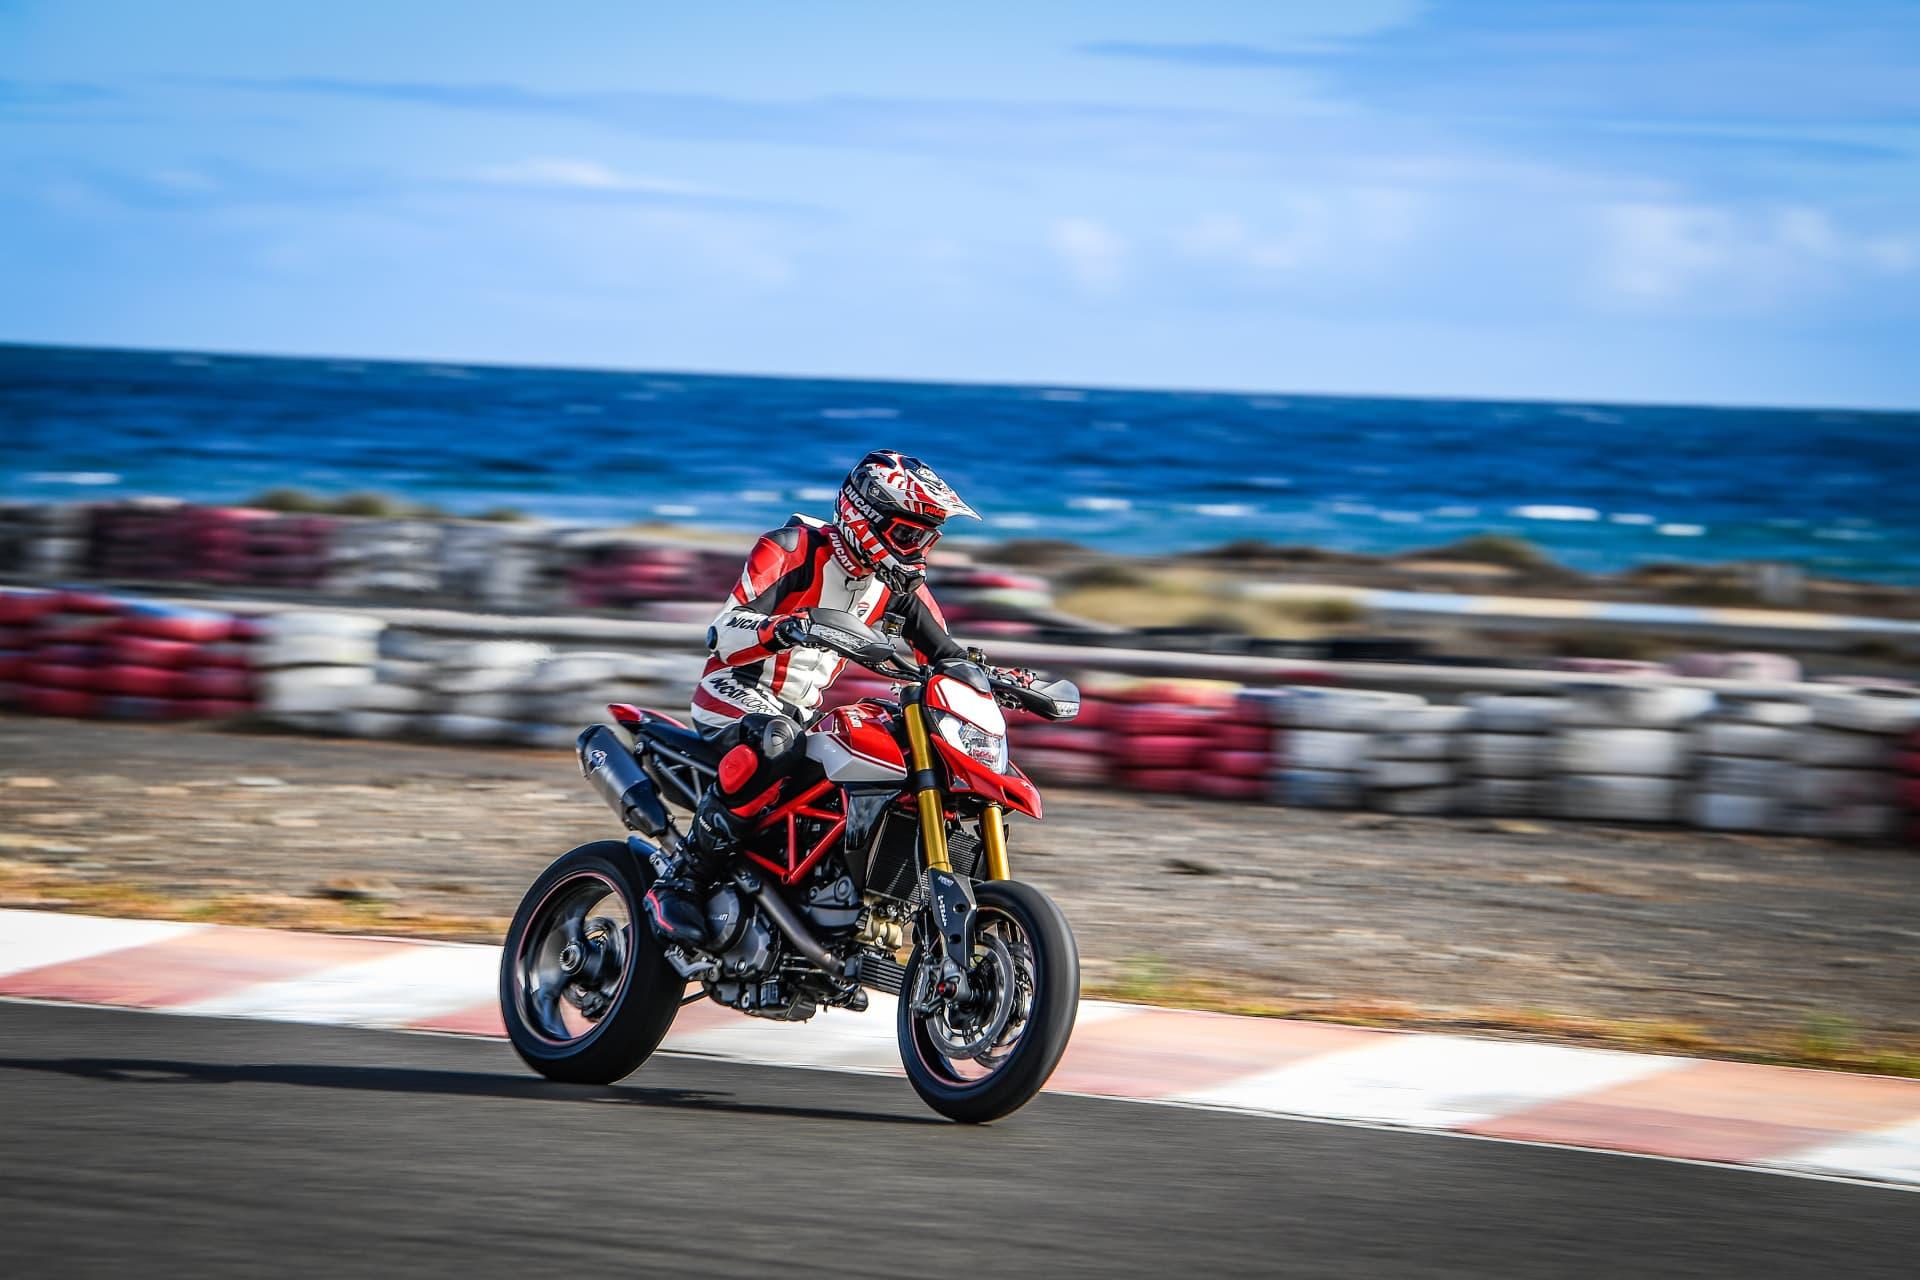 Ducati Hypermotard 950 Sp Performance 00 Uc70344 Mid